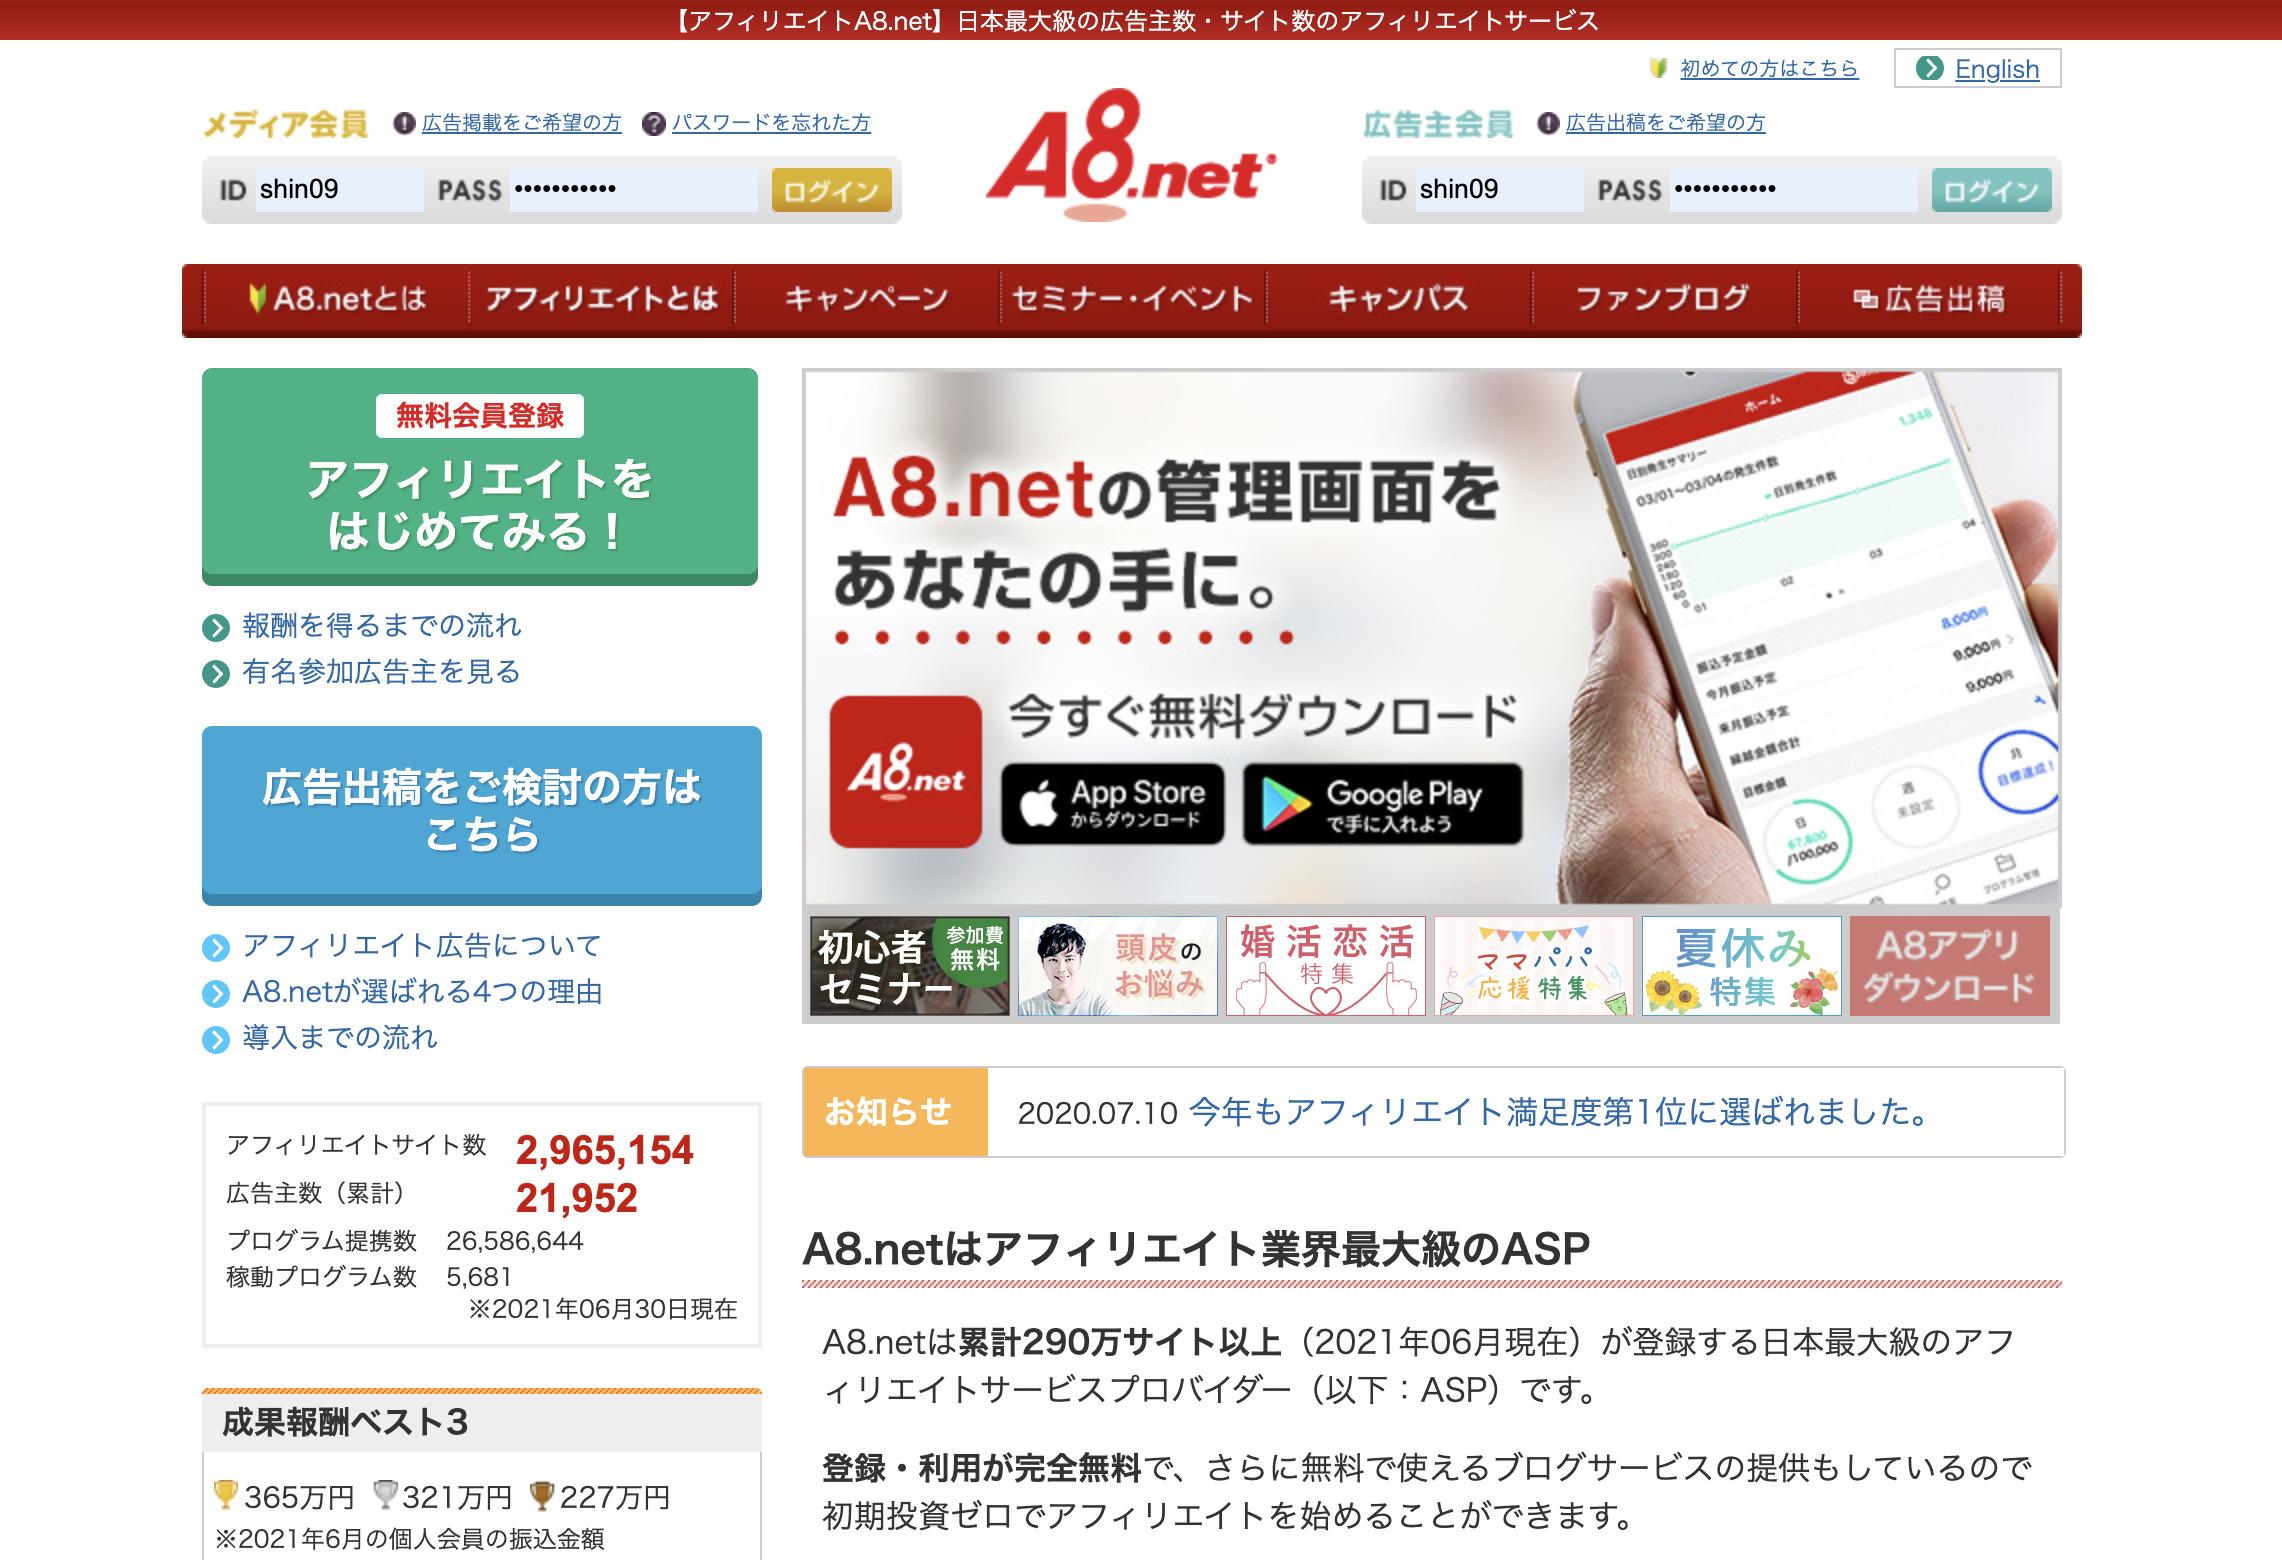 a8net公式サイトのトップページ画像